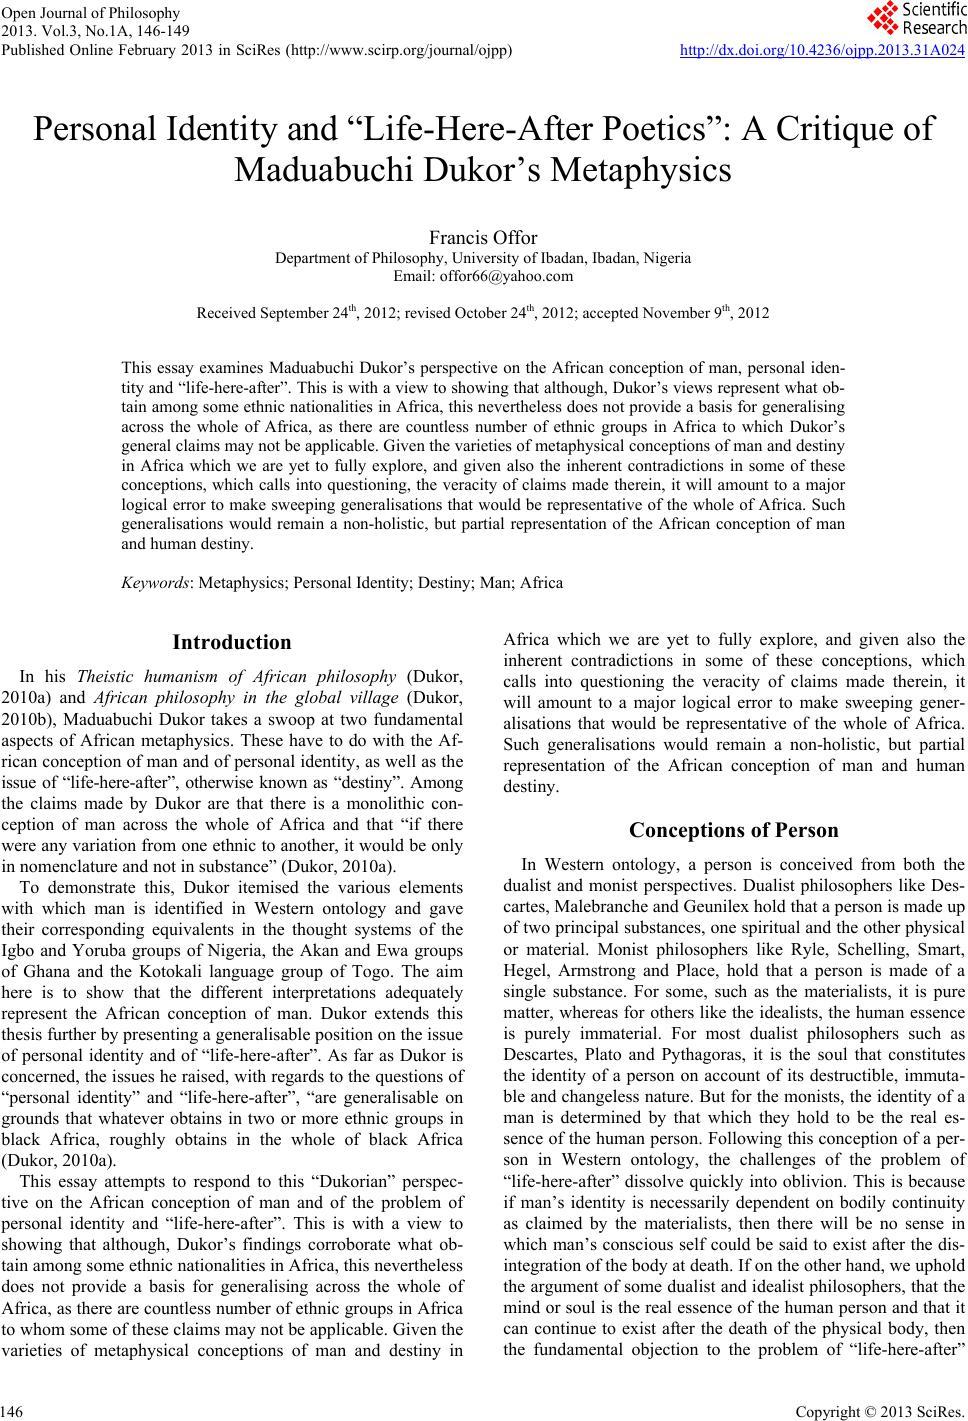 identity essay thesis statement